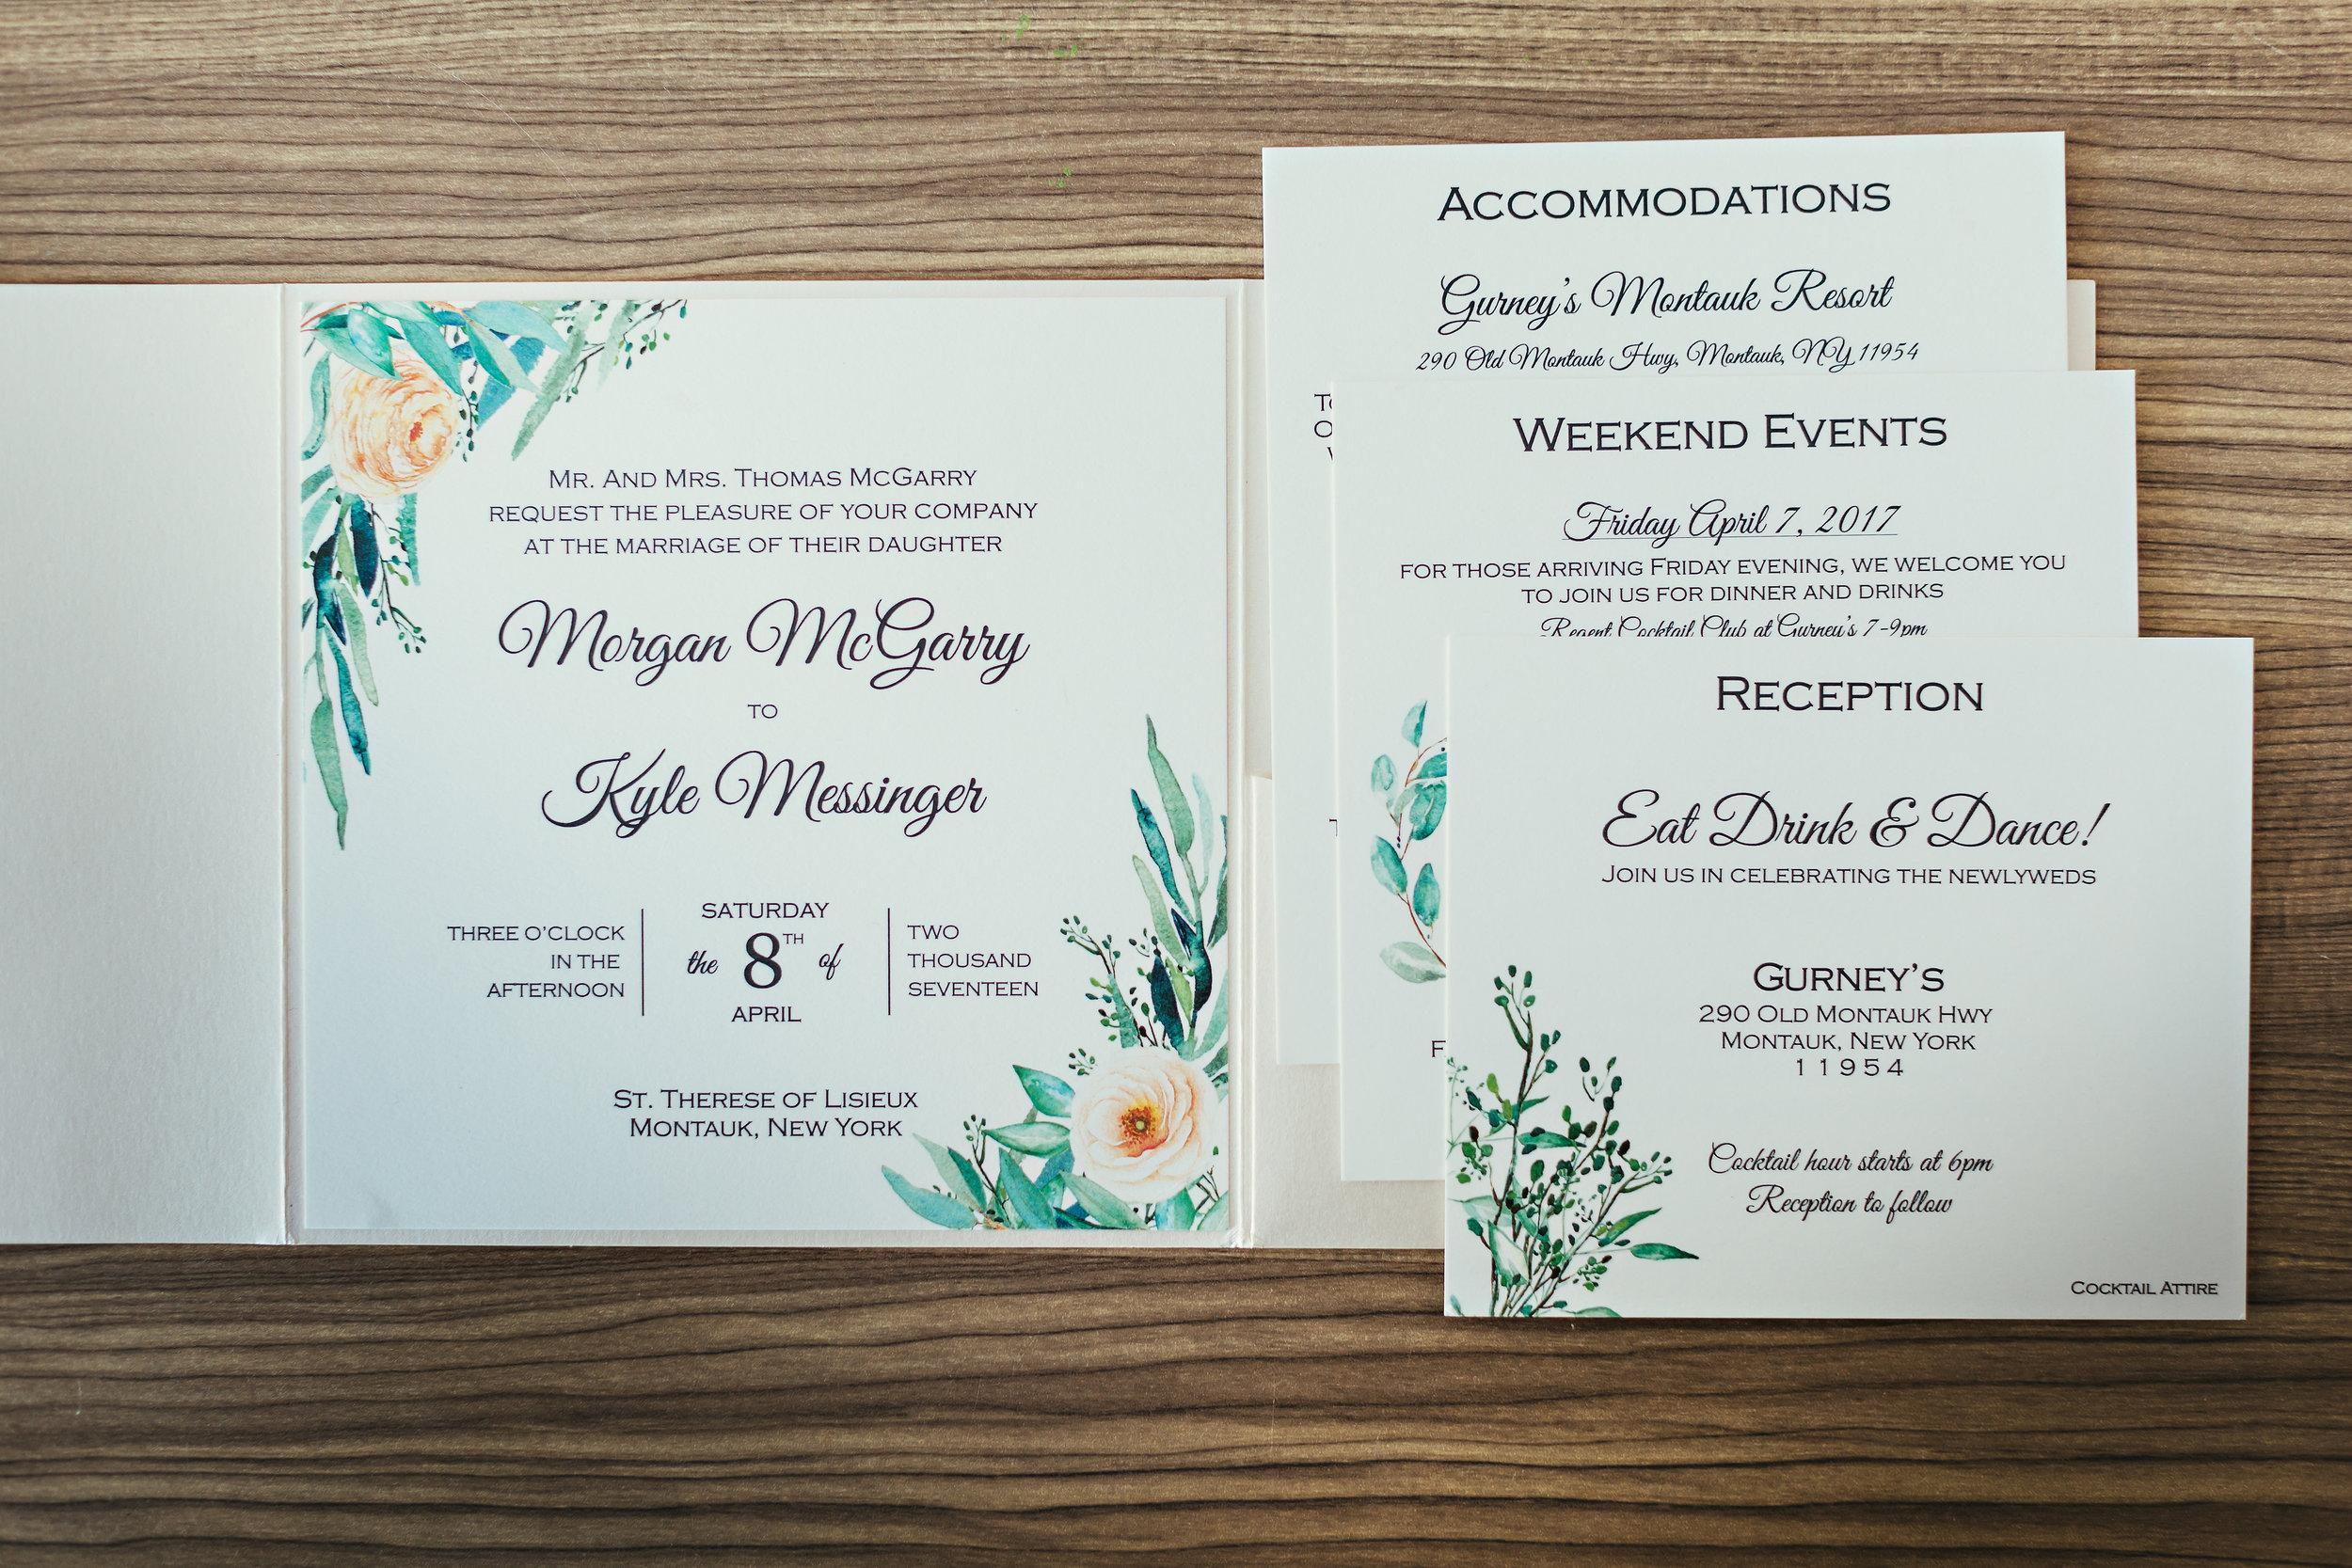 Gurneys-Montauk-Wedding-detail -0011.jpg